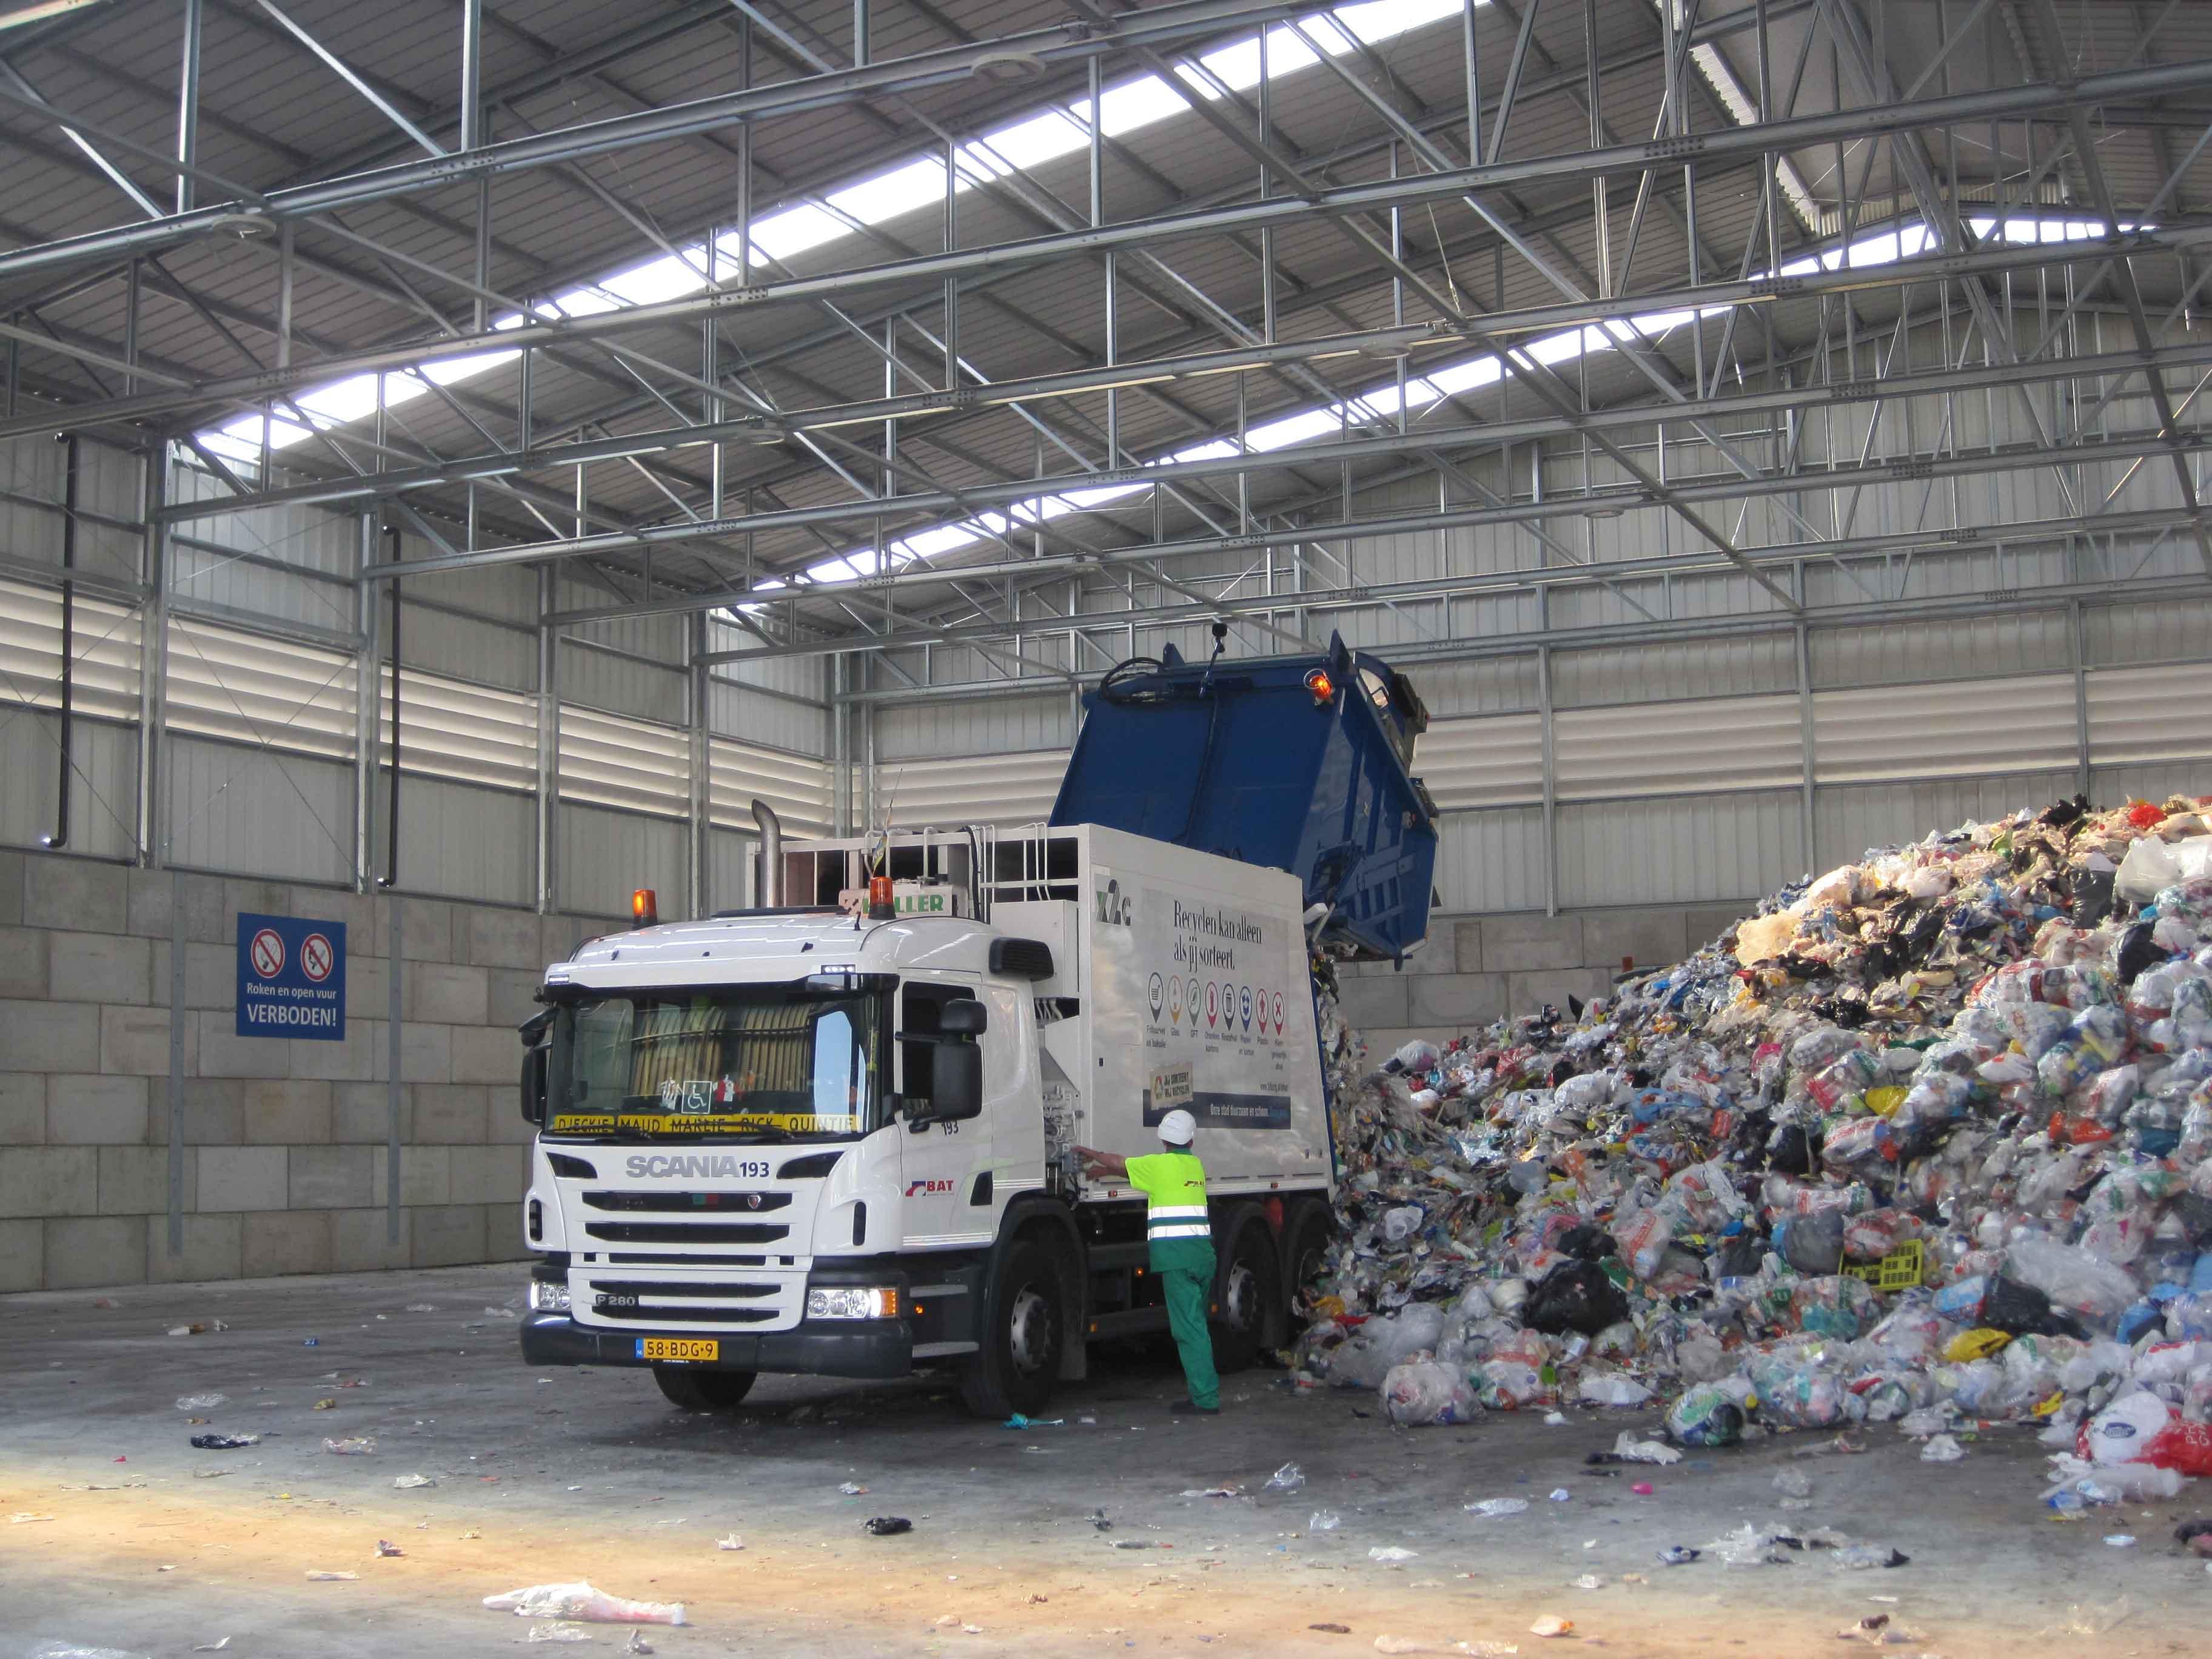 recyclagecentra opslag verwerking